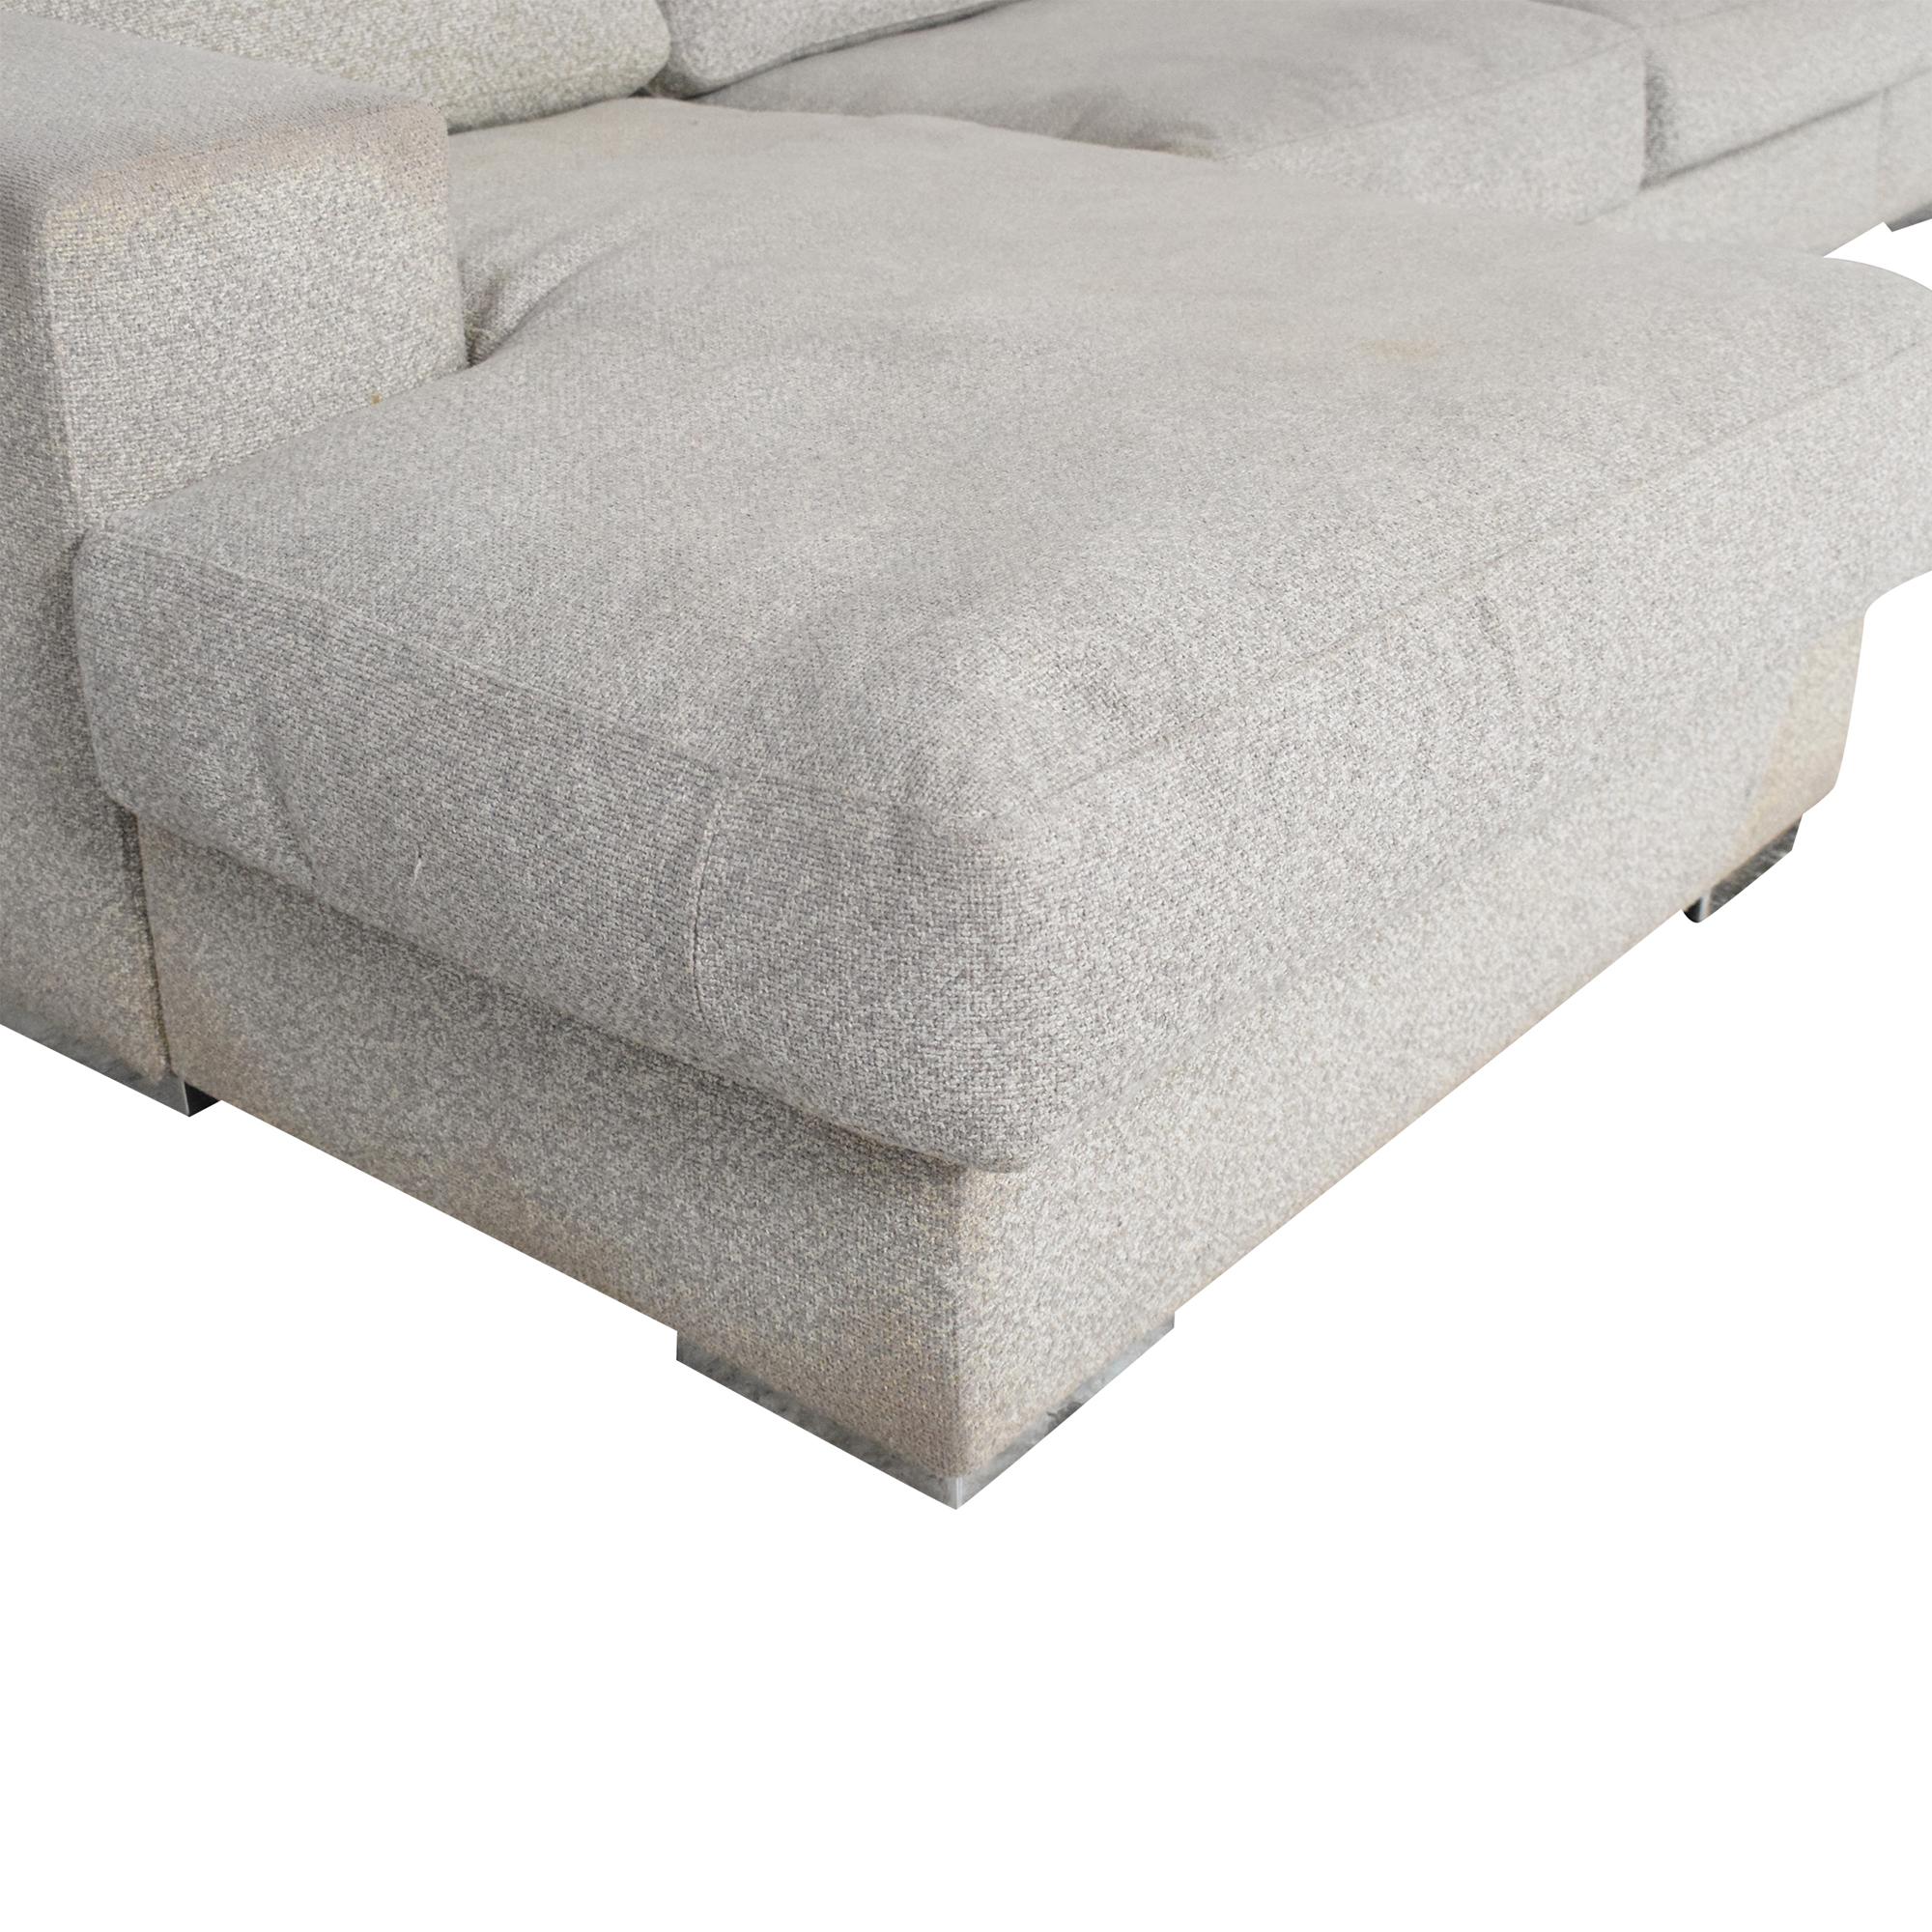 BoConcept BoConcept Chaise Sectional Sofa coupon